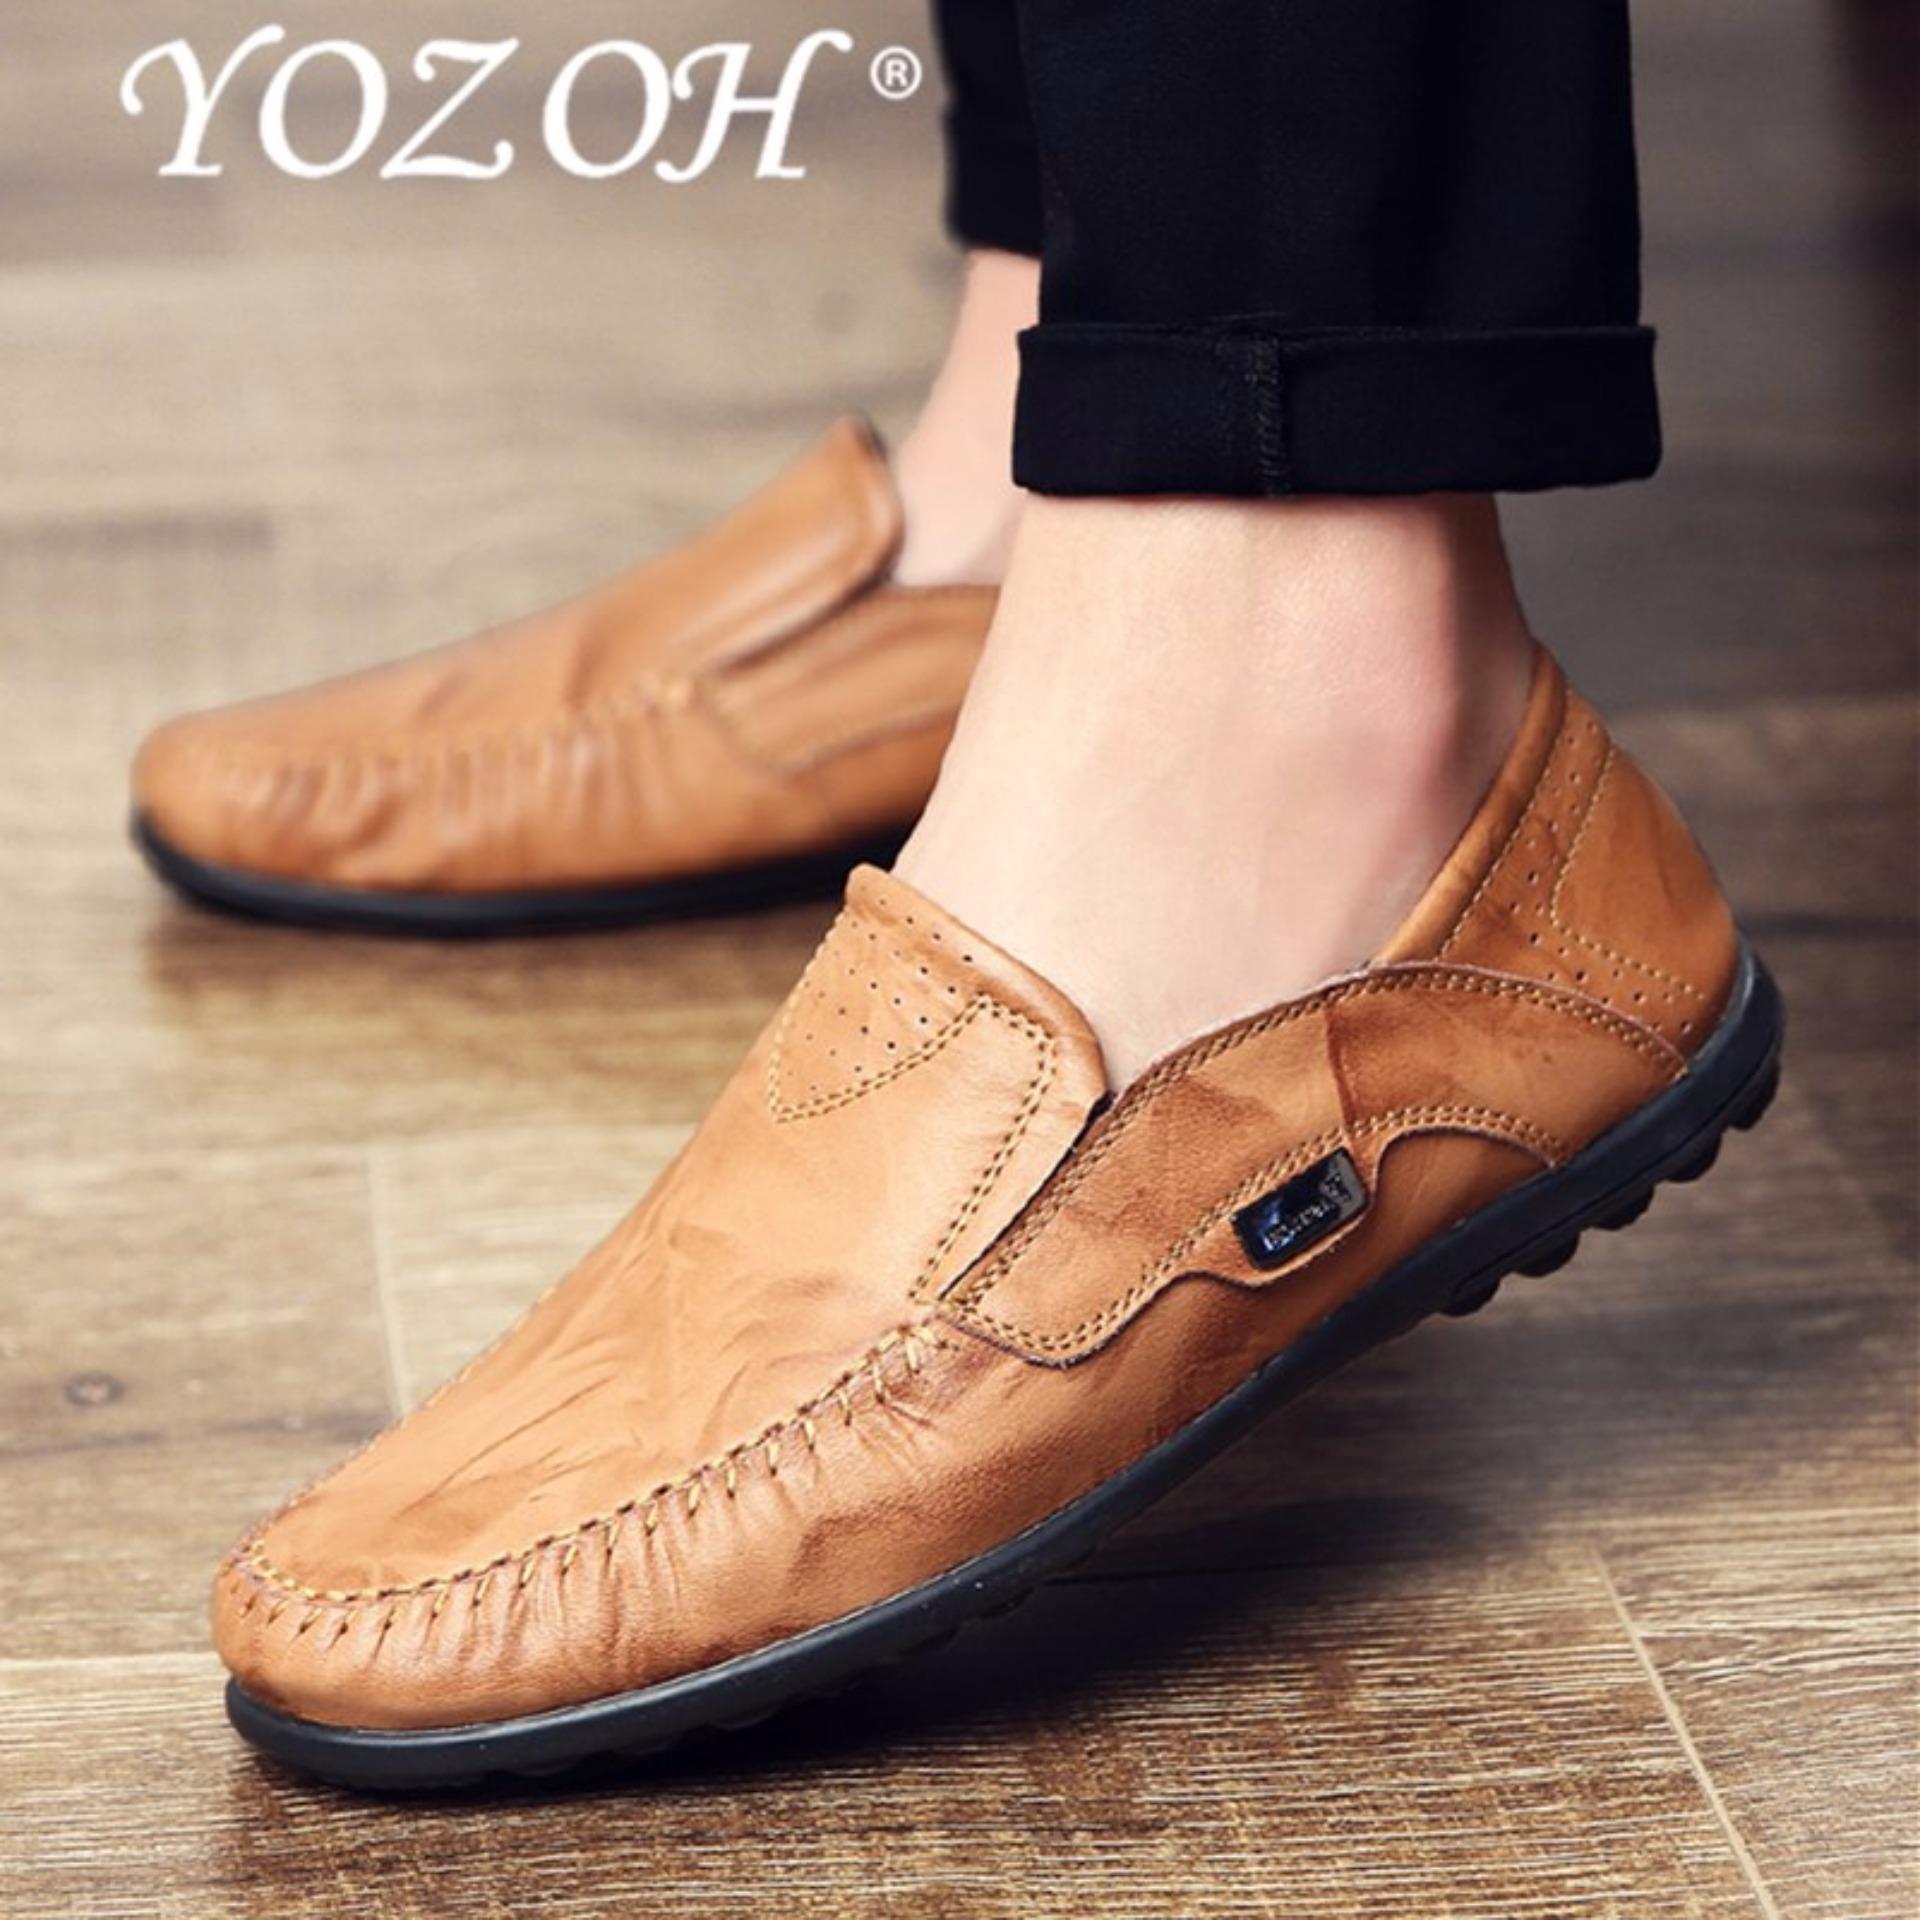 Yozoh Vintage Kulit Asli Lembut Loafers Untuk Pria Slip On Moccasin Boat Flats Sepatu Kuning Intl Tiongkok Diskon 50